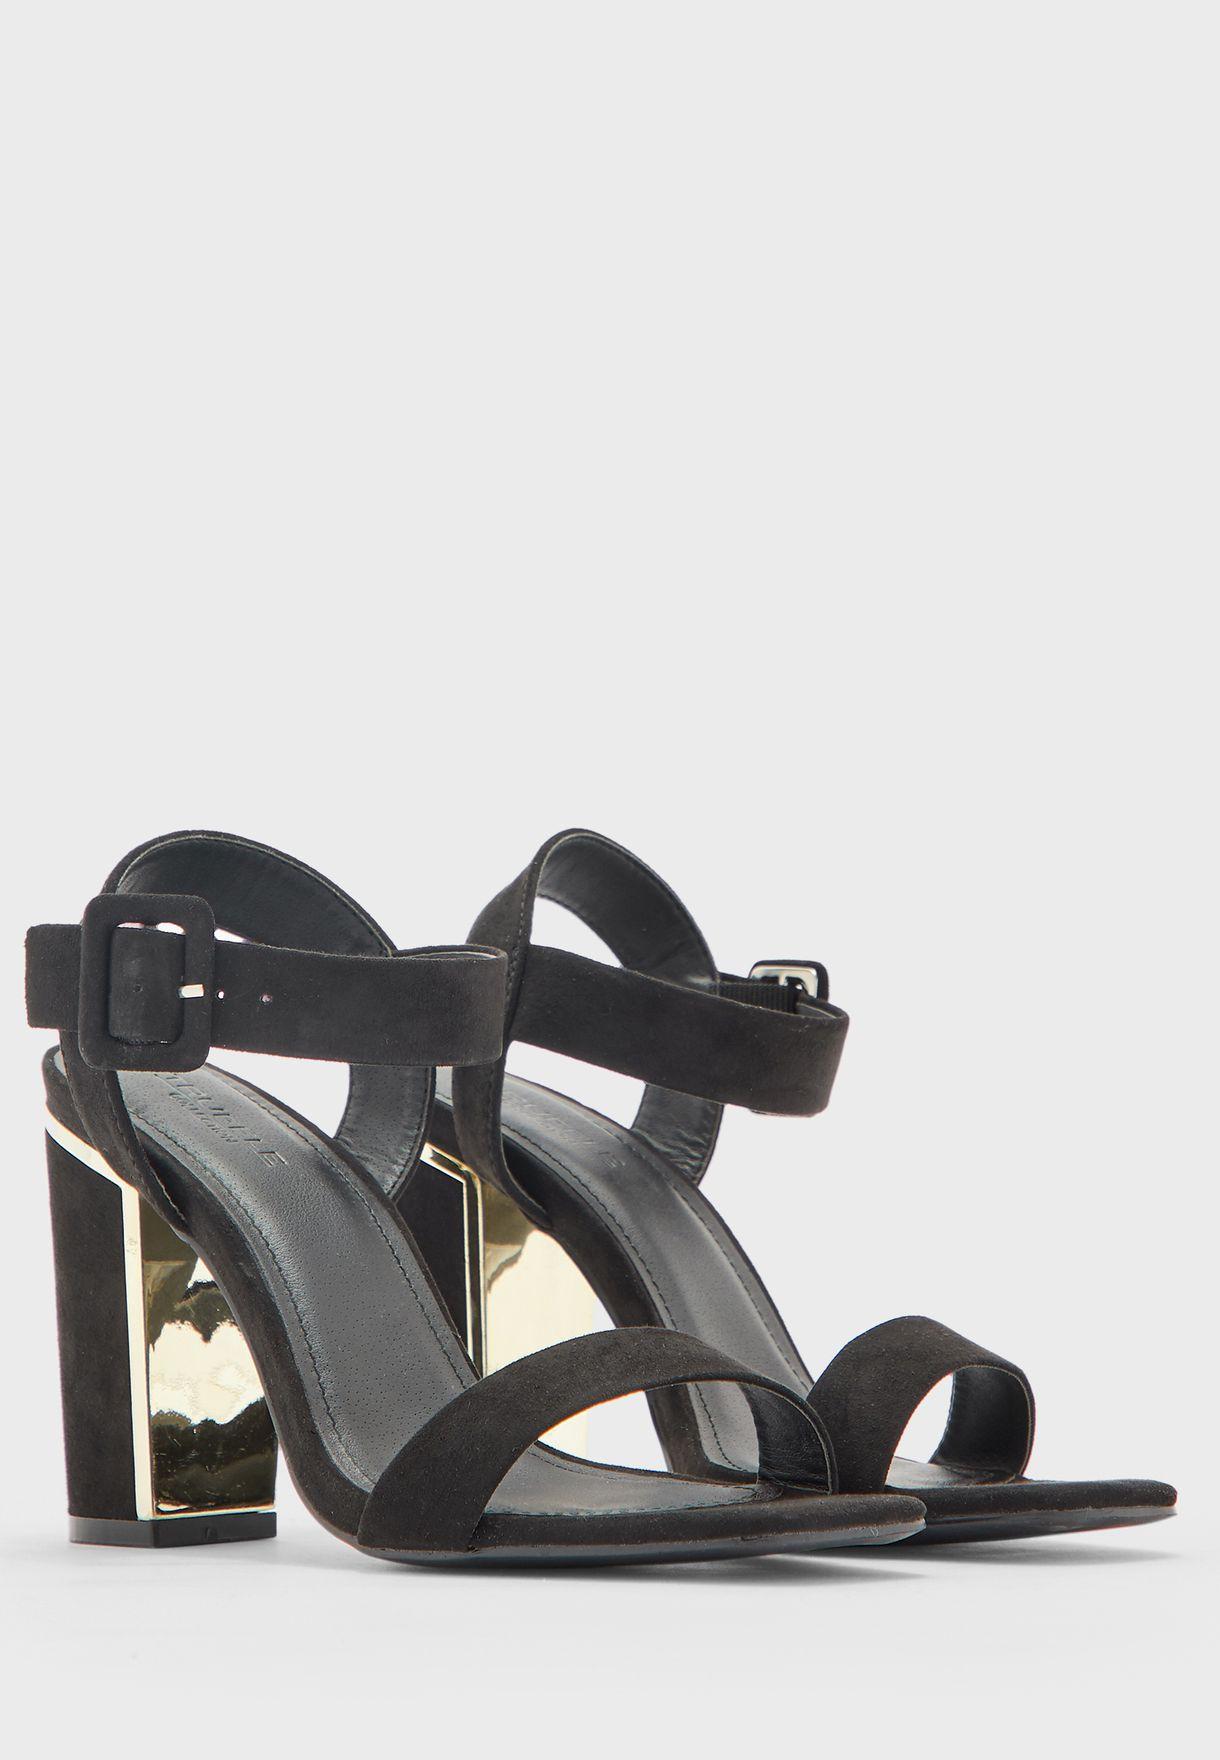 Buckle Ankle Strap Block Heel Sandal